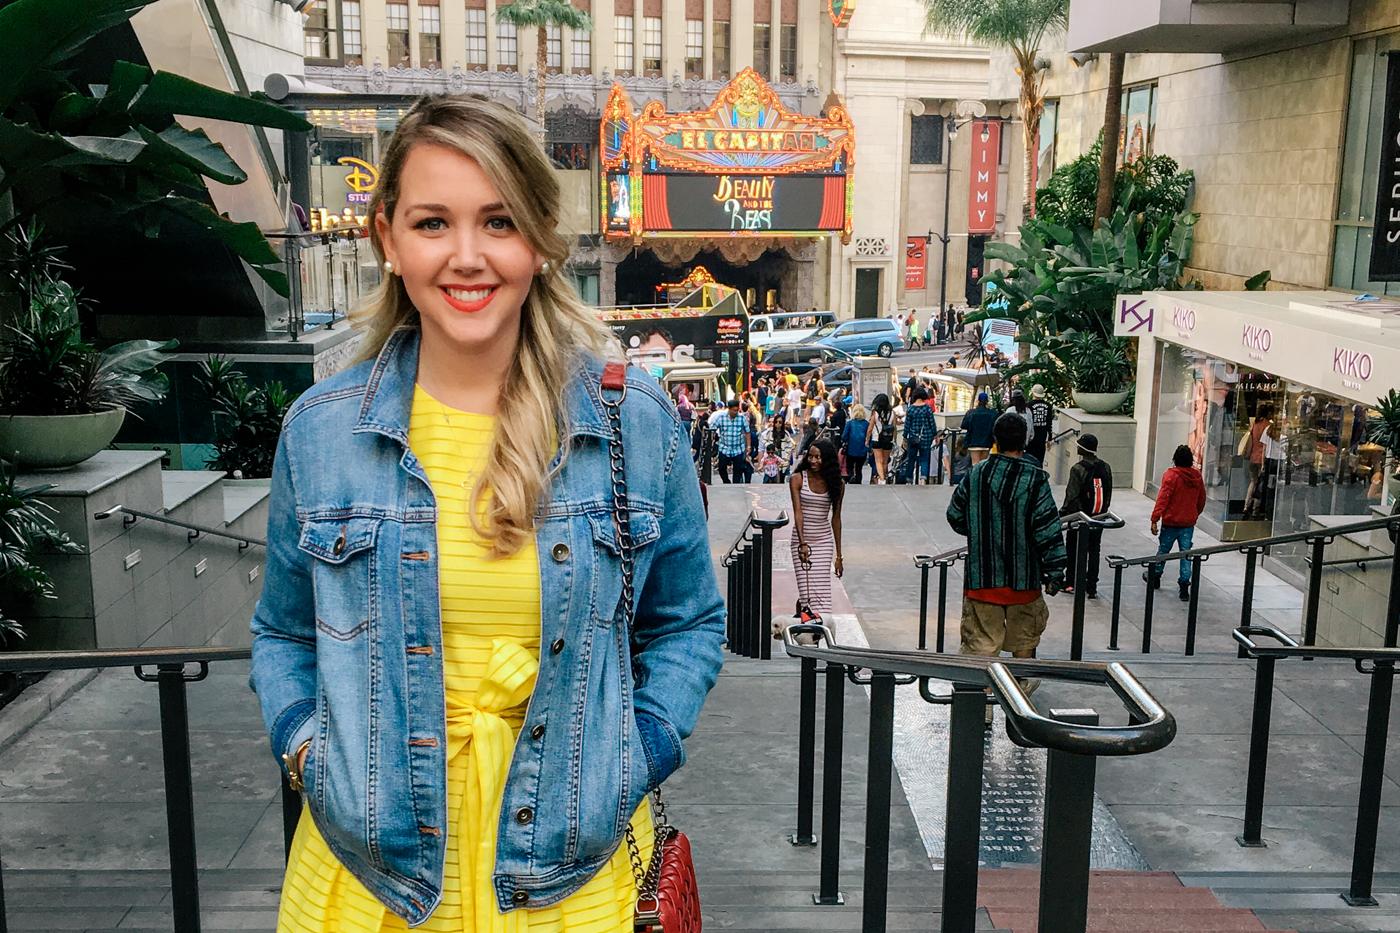 Debora Dahl, Beauty and the Beast at El Capitan in LA